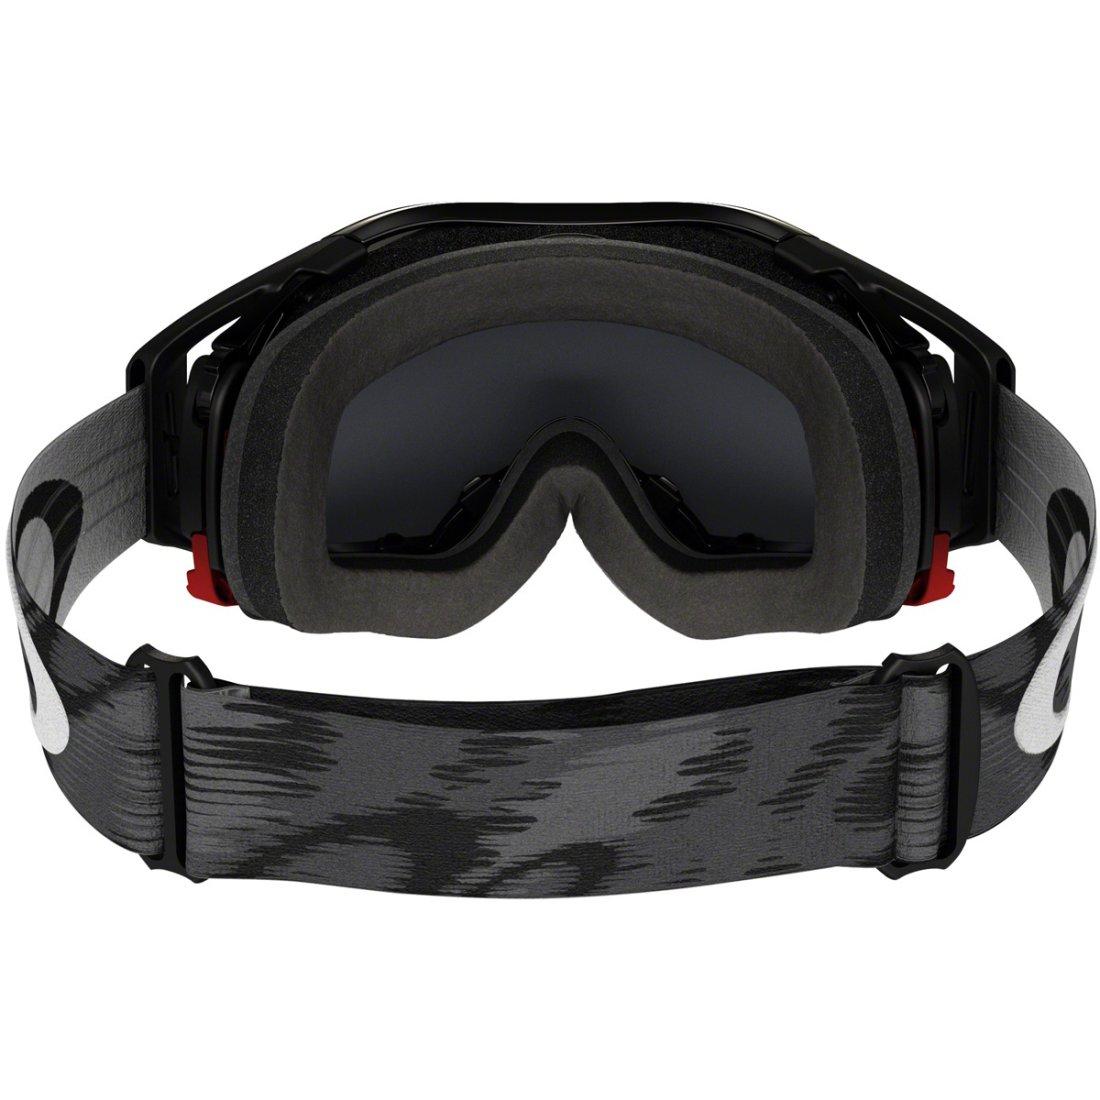 OAKLEY Airbrake MX Jet Black Speed Dark Grey Goggles · Motocard 66e2a733473f